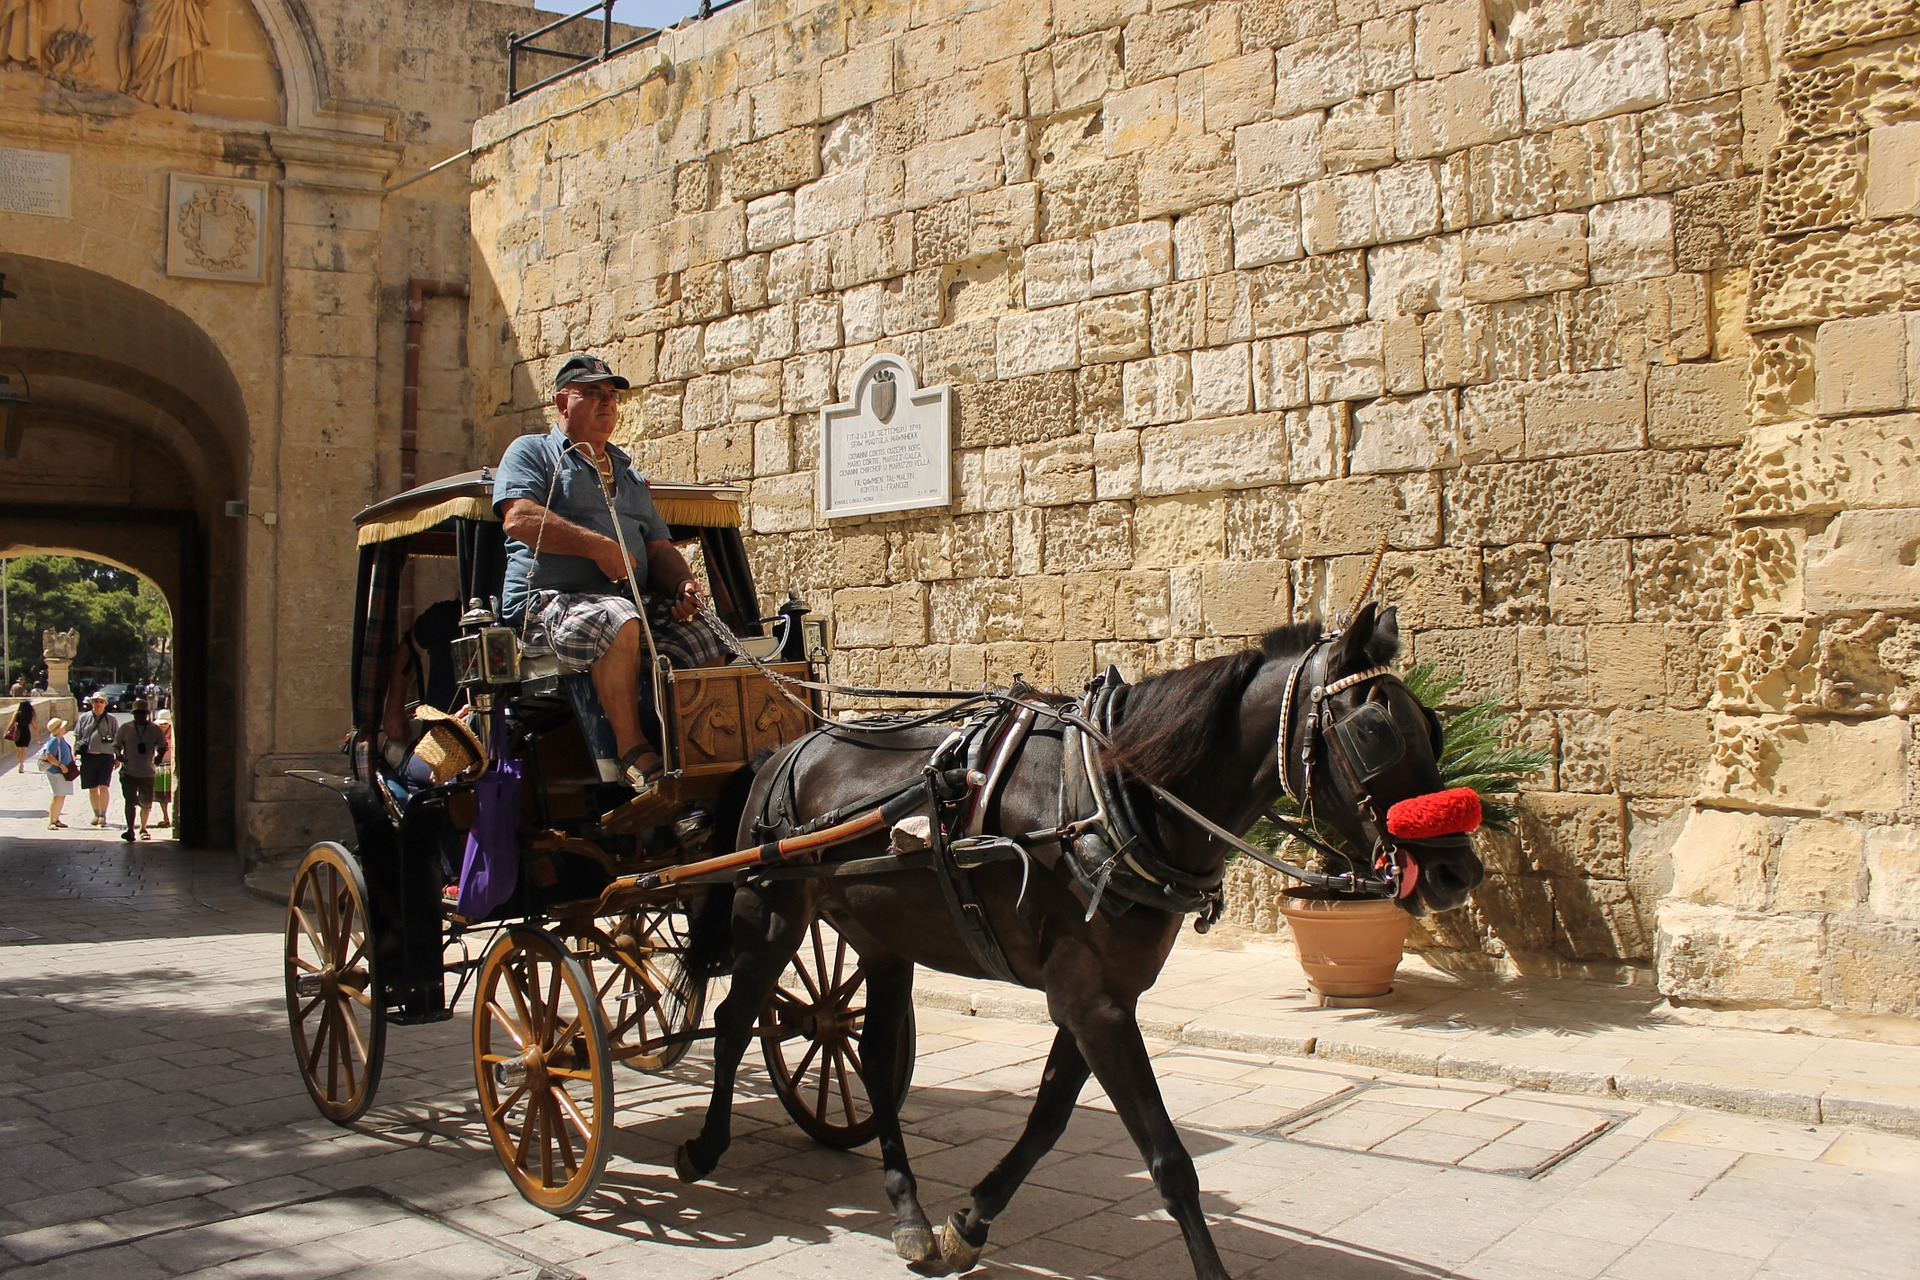 Malta photo by viajeminuto